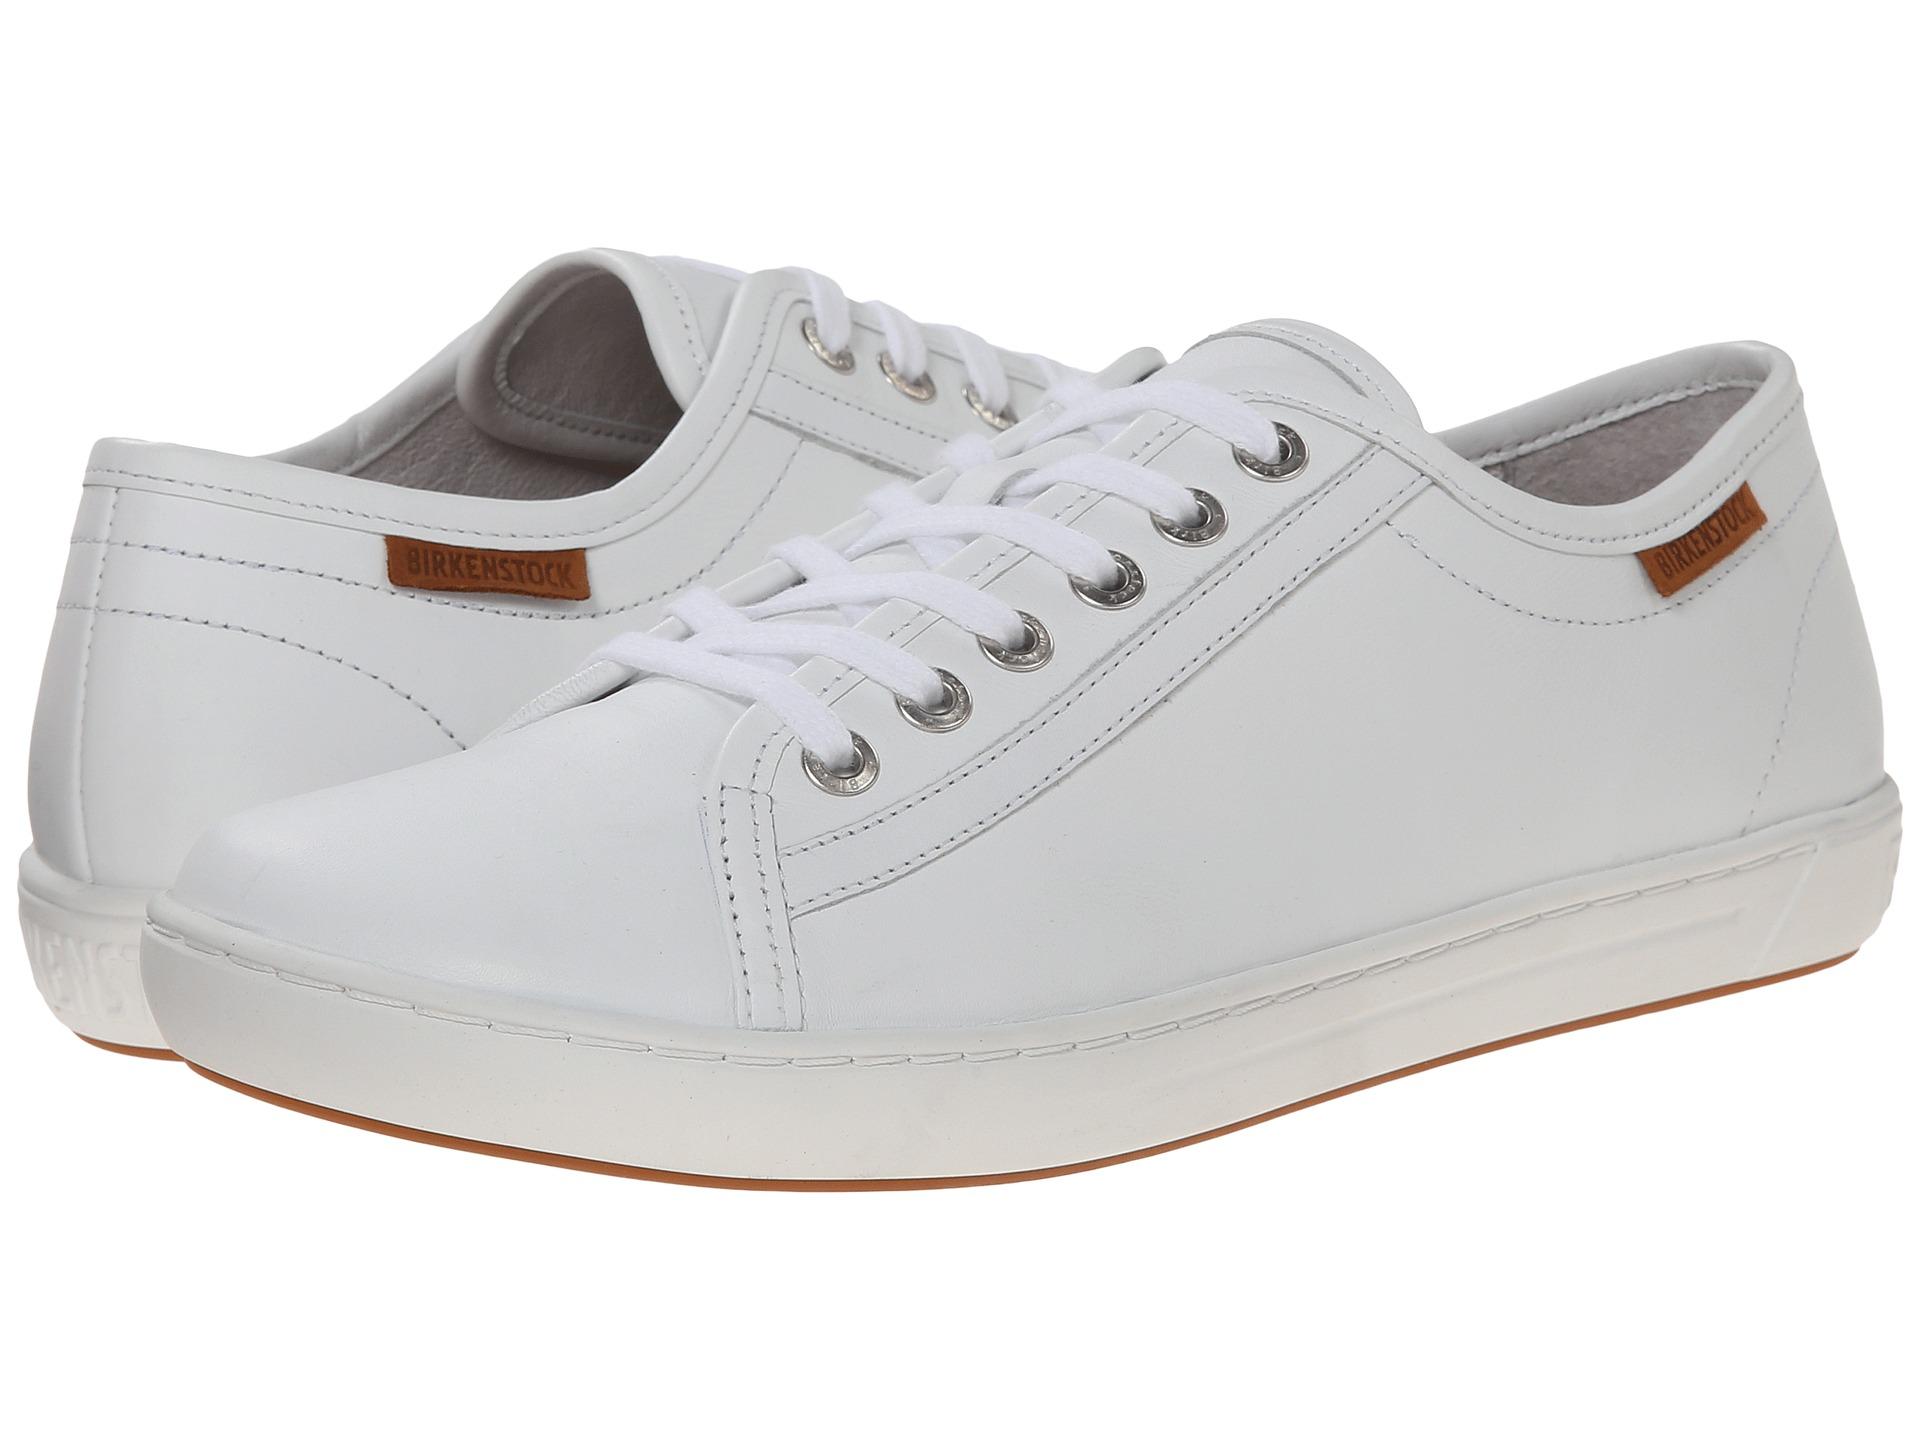 birkenstock arran s white leather zappos